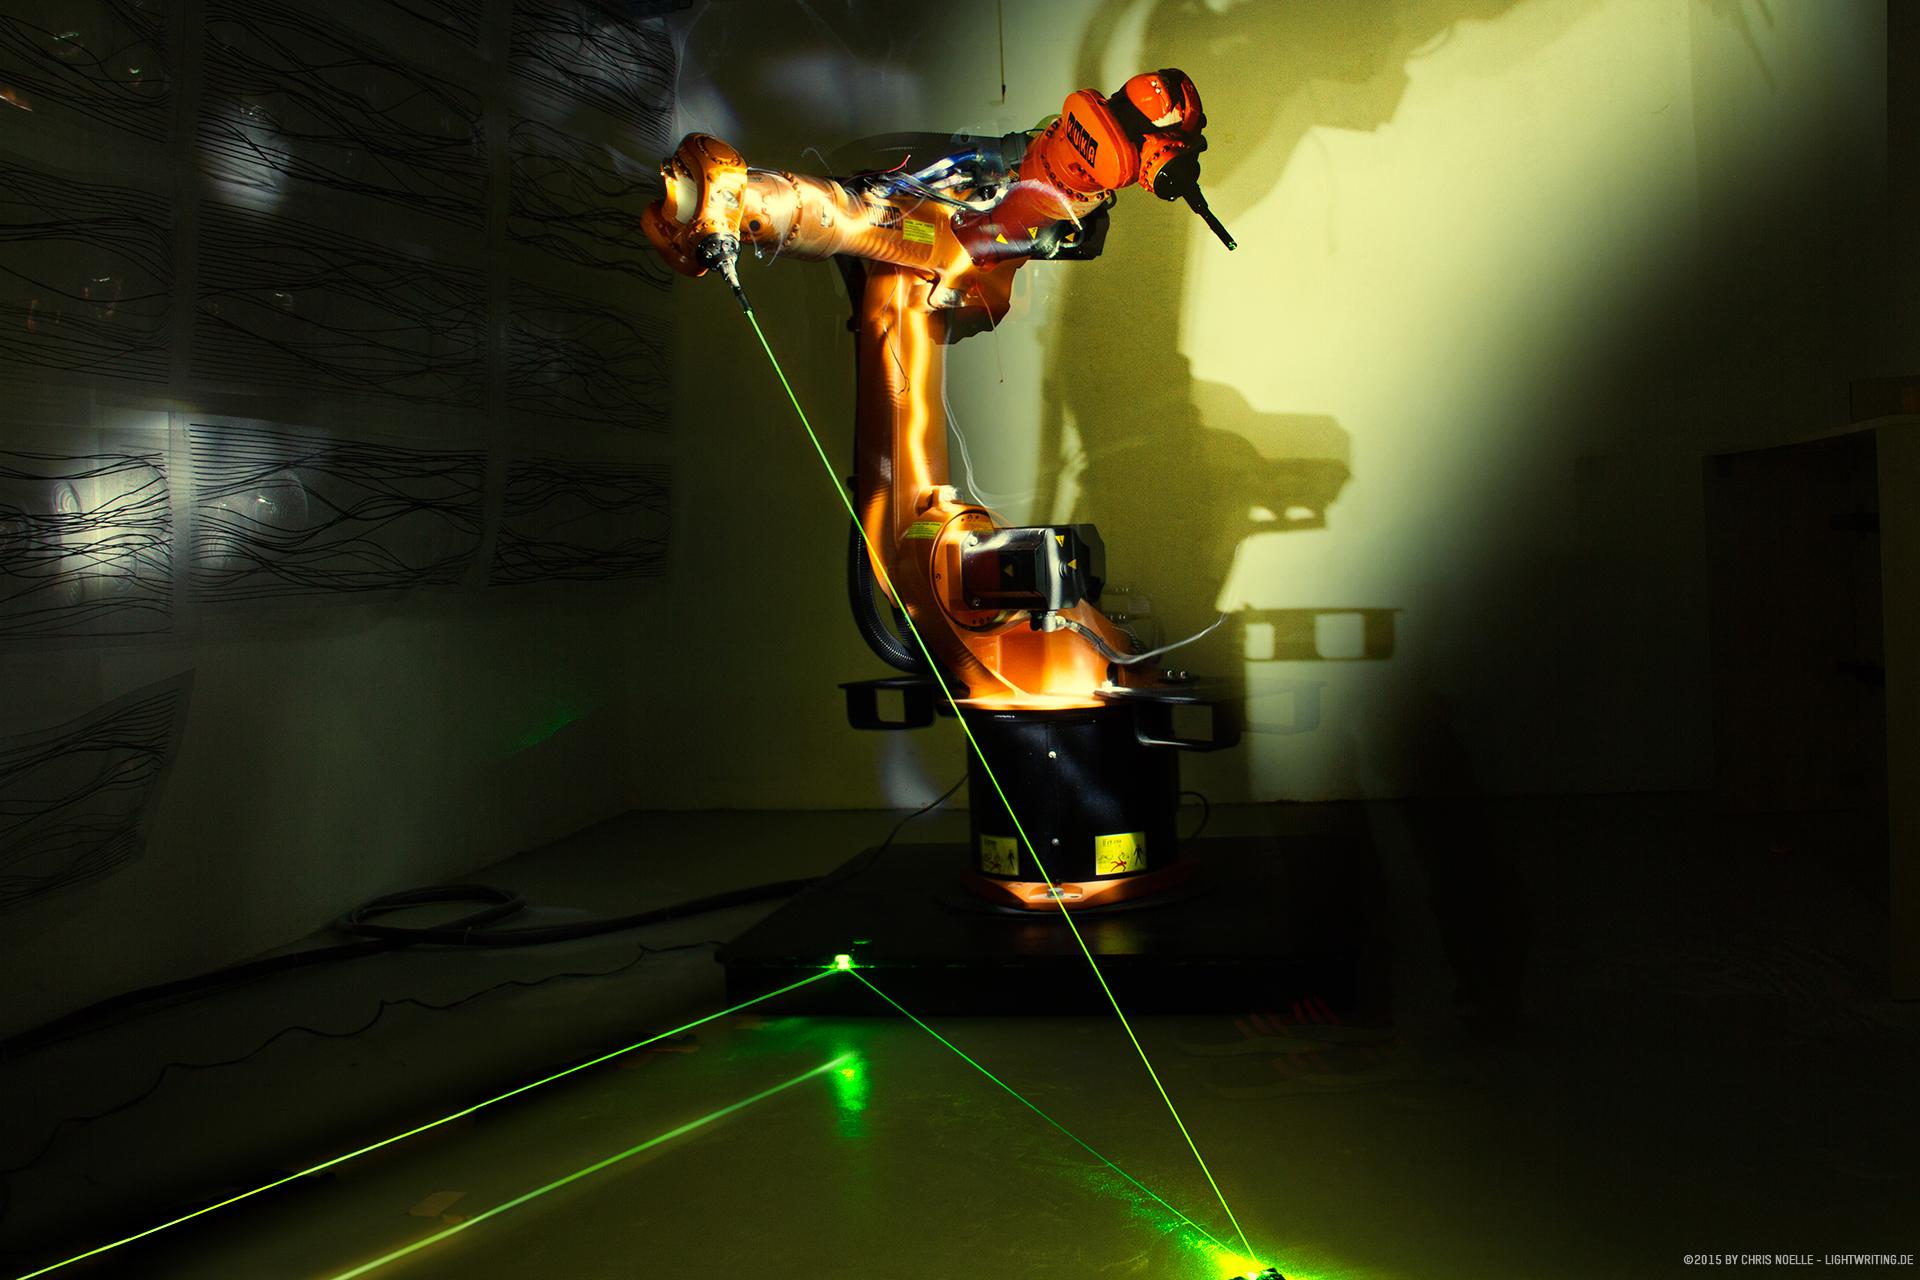 ROBOTIC LASER CASESTUDY